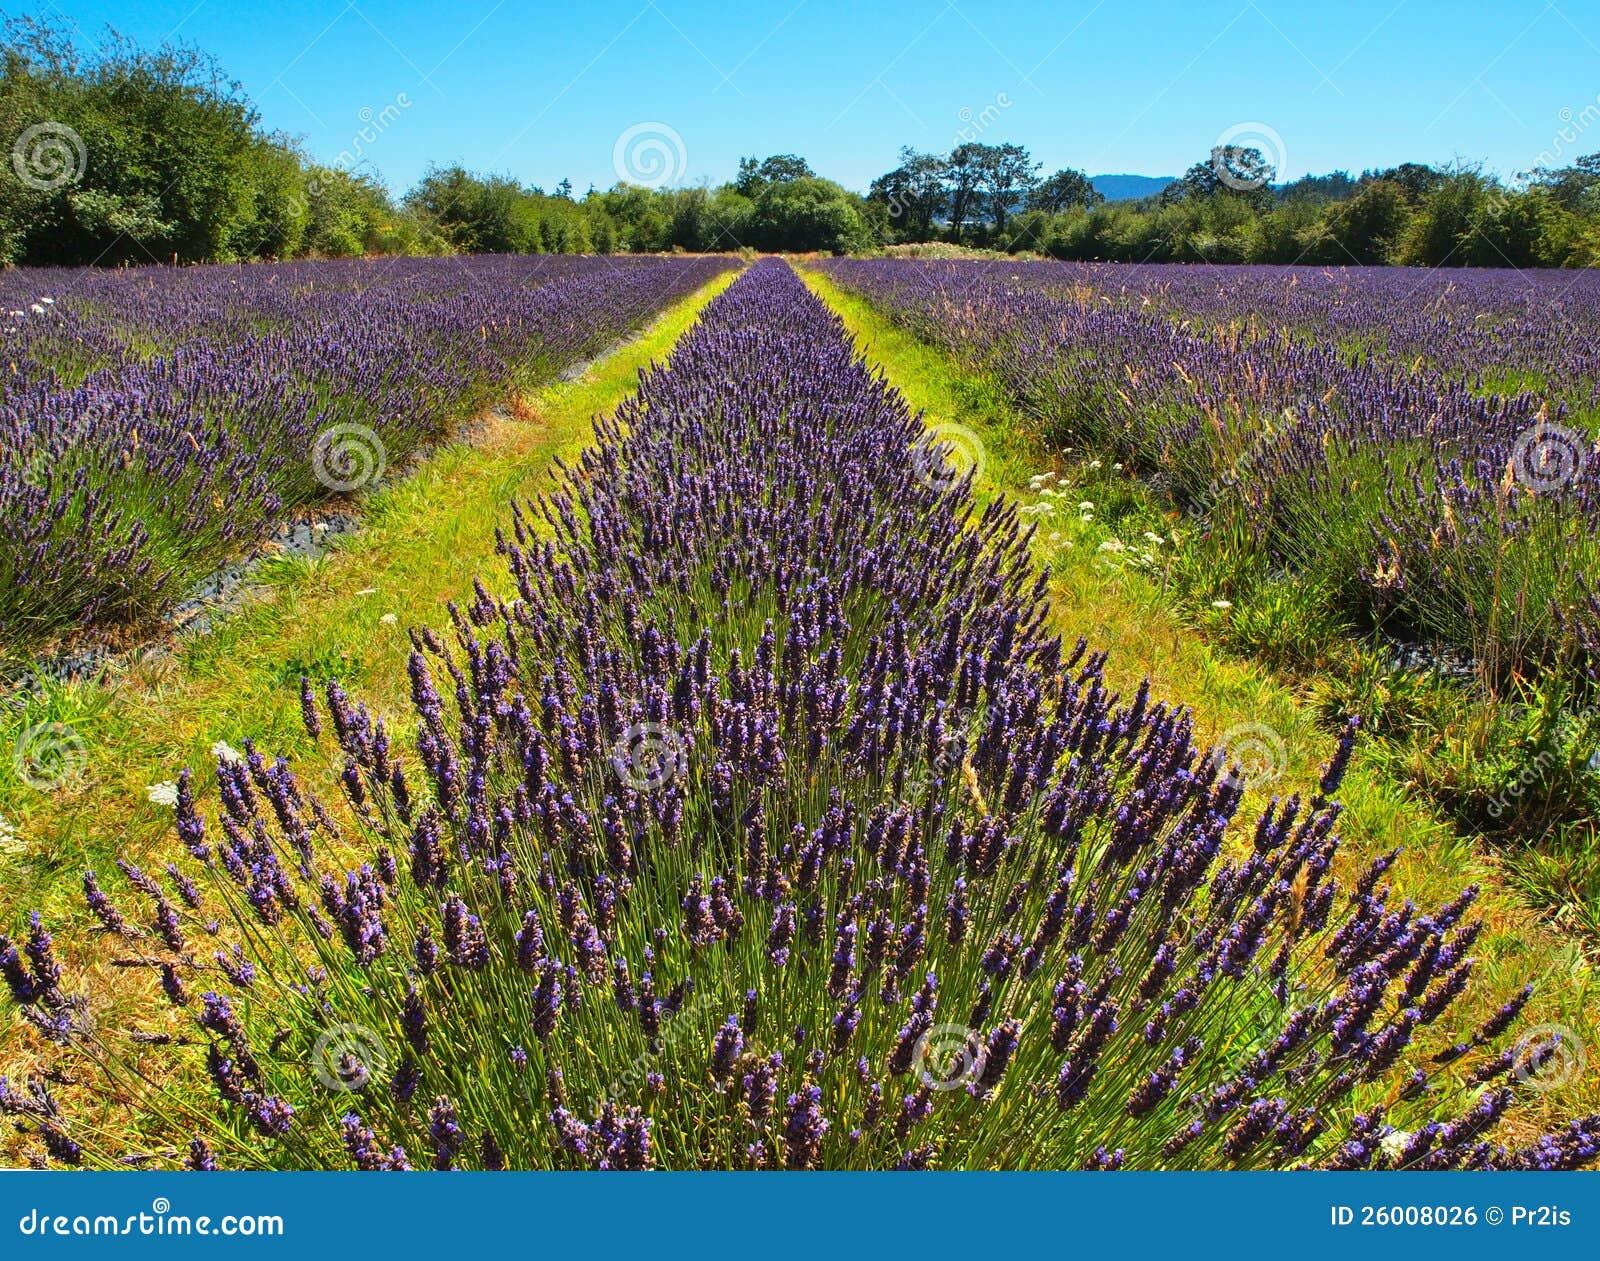 Lavender farming business plan